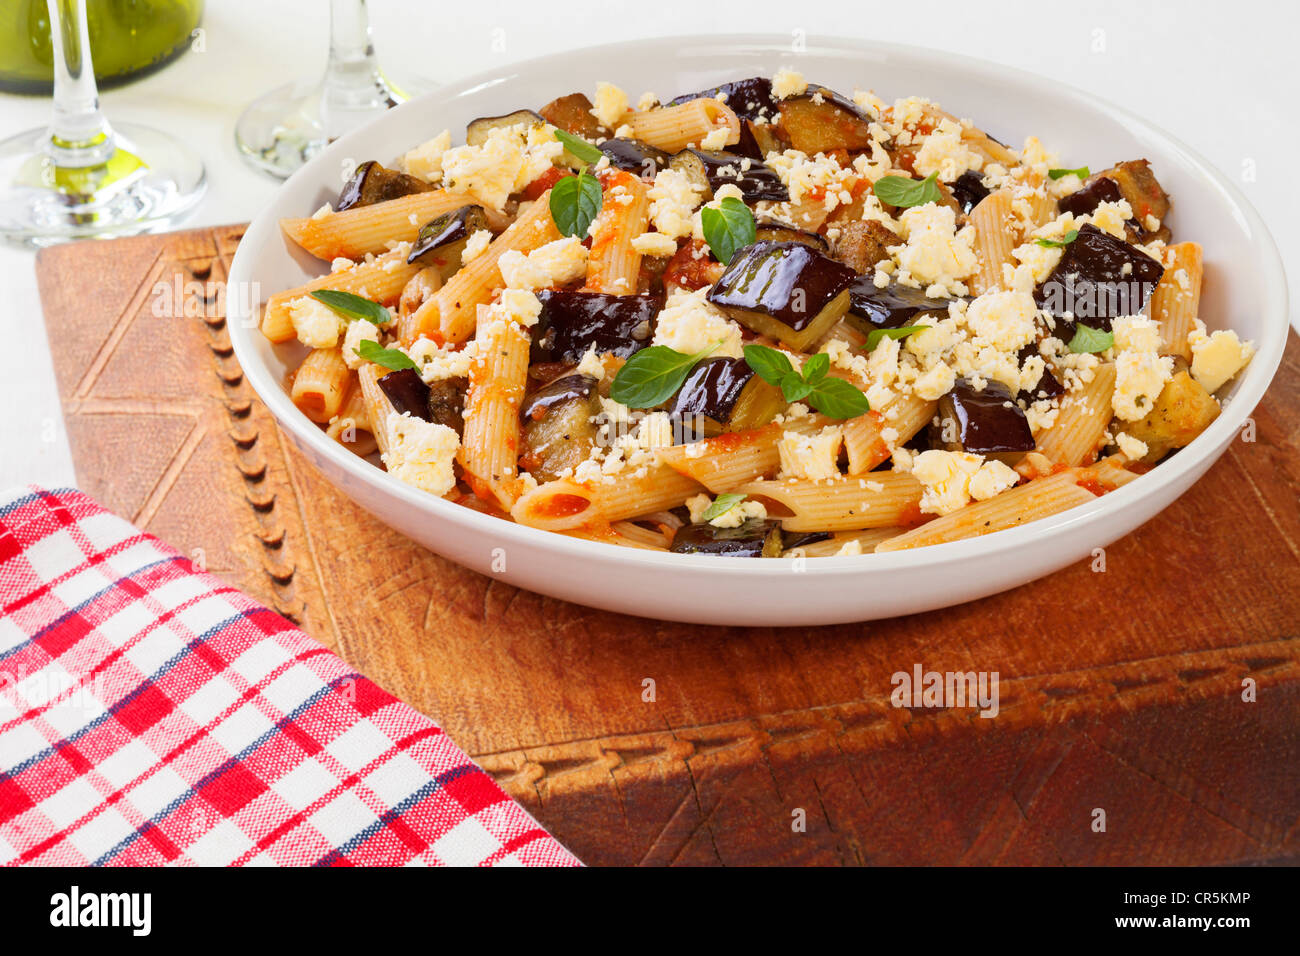 The national dish of Sicily, Pasta alla Norma tastes wonderful. - Stock Image